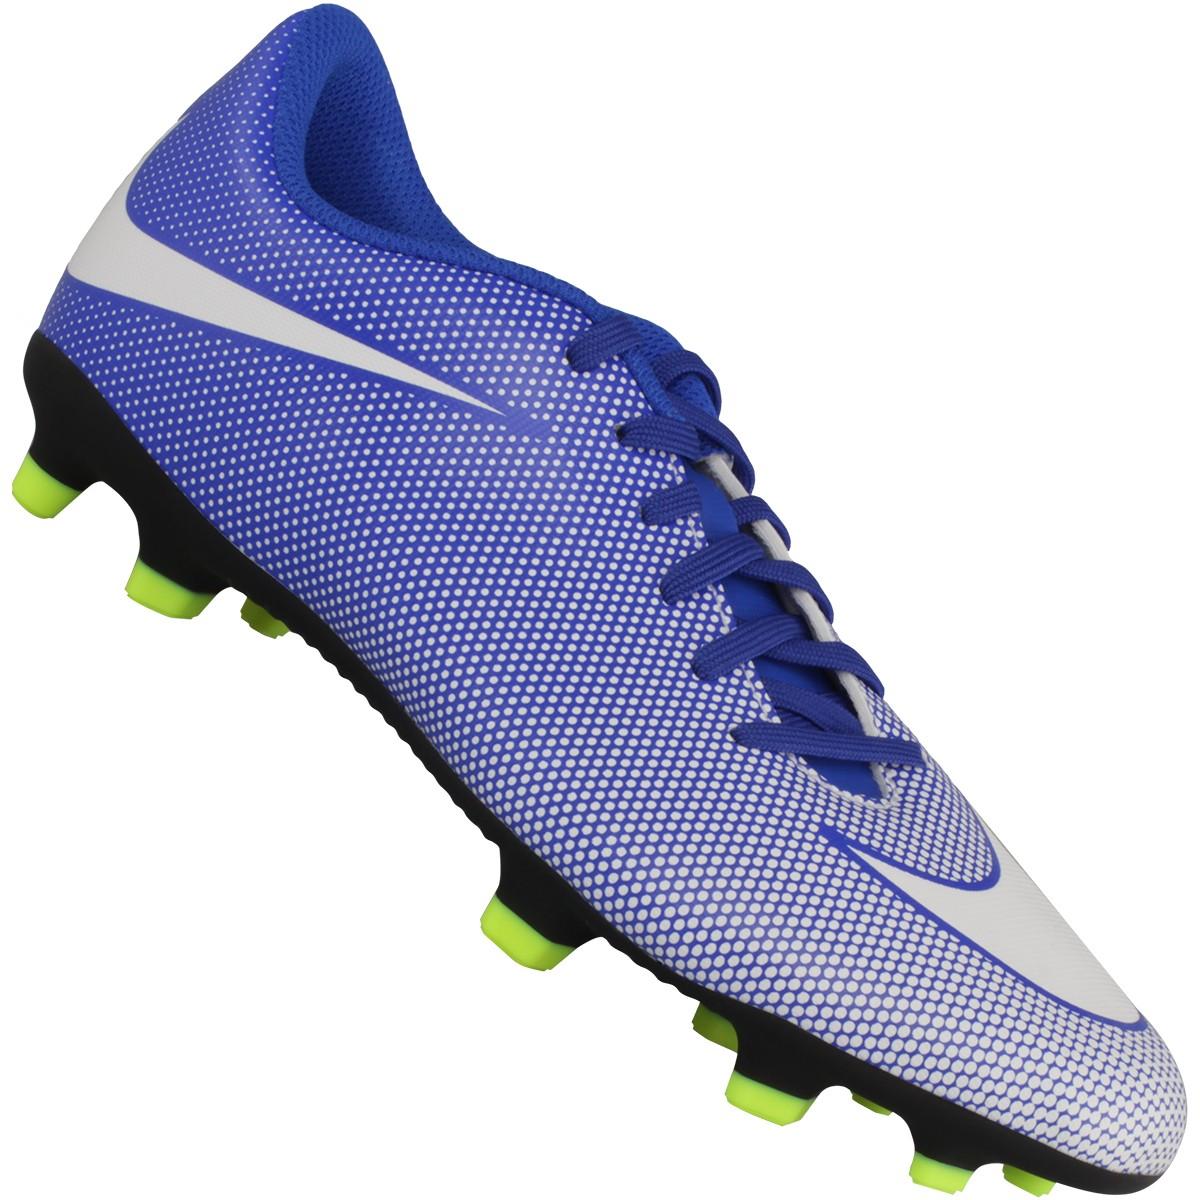 0f208cf738 Chuteira Nike Bravata 2 FG